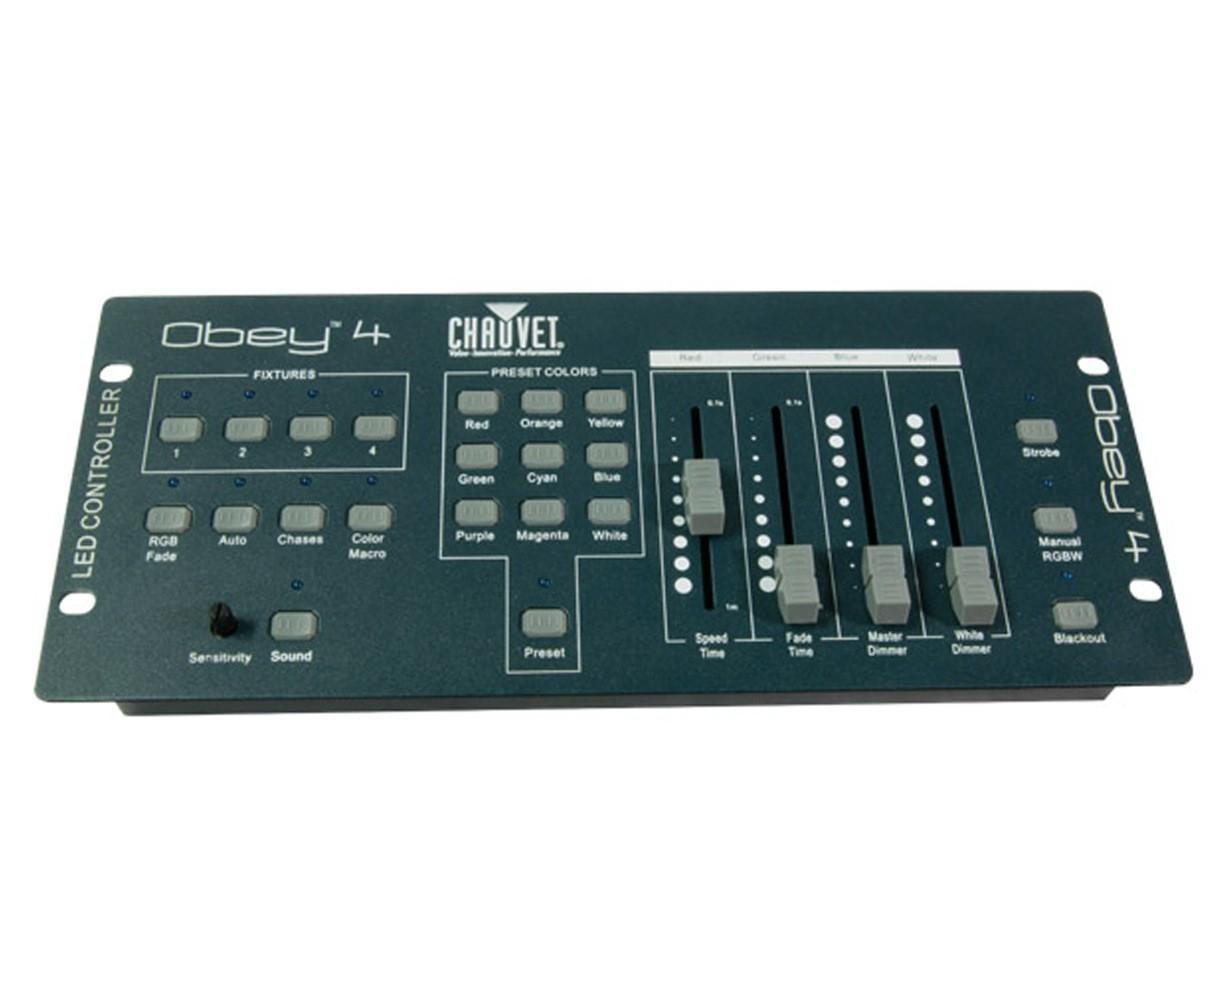 CHA-OBEY4